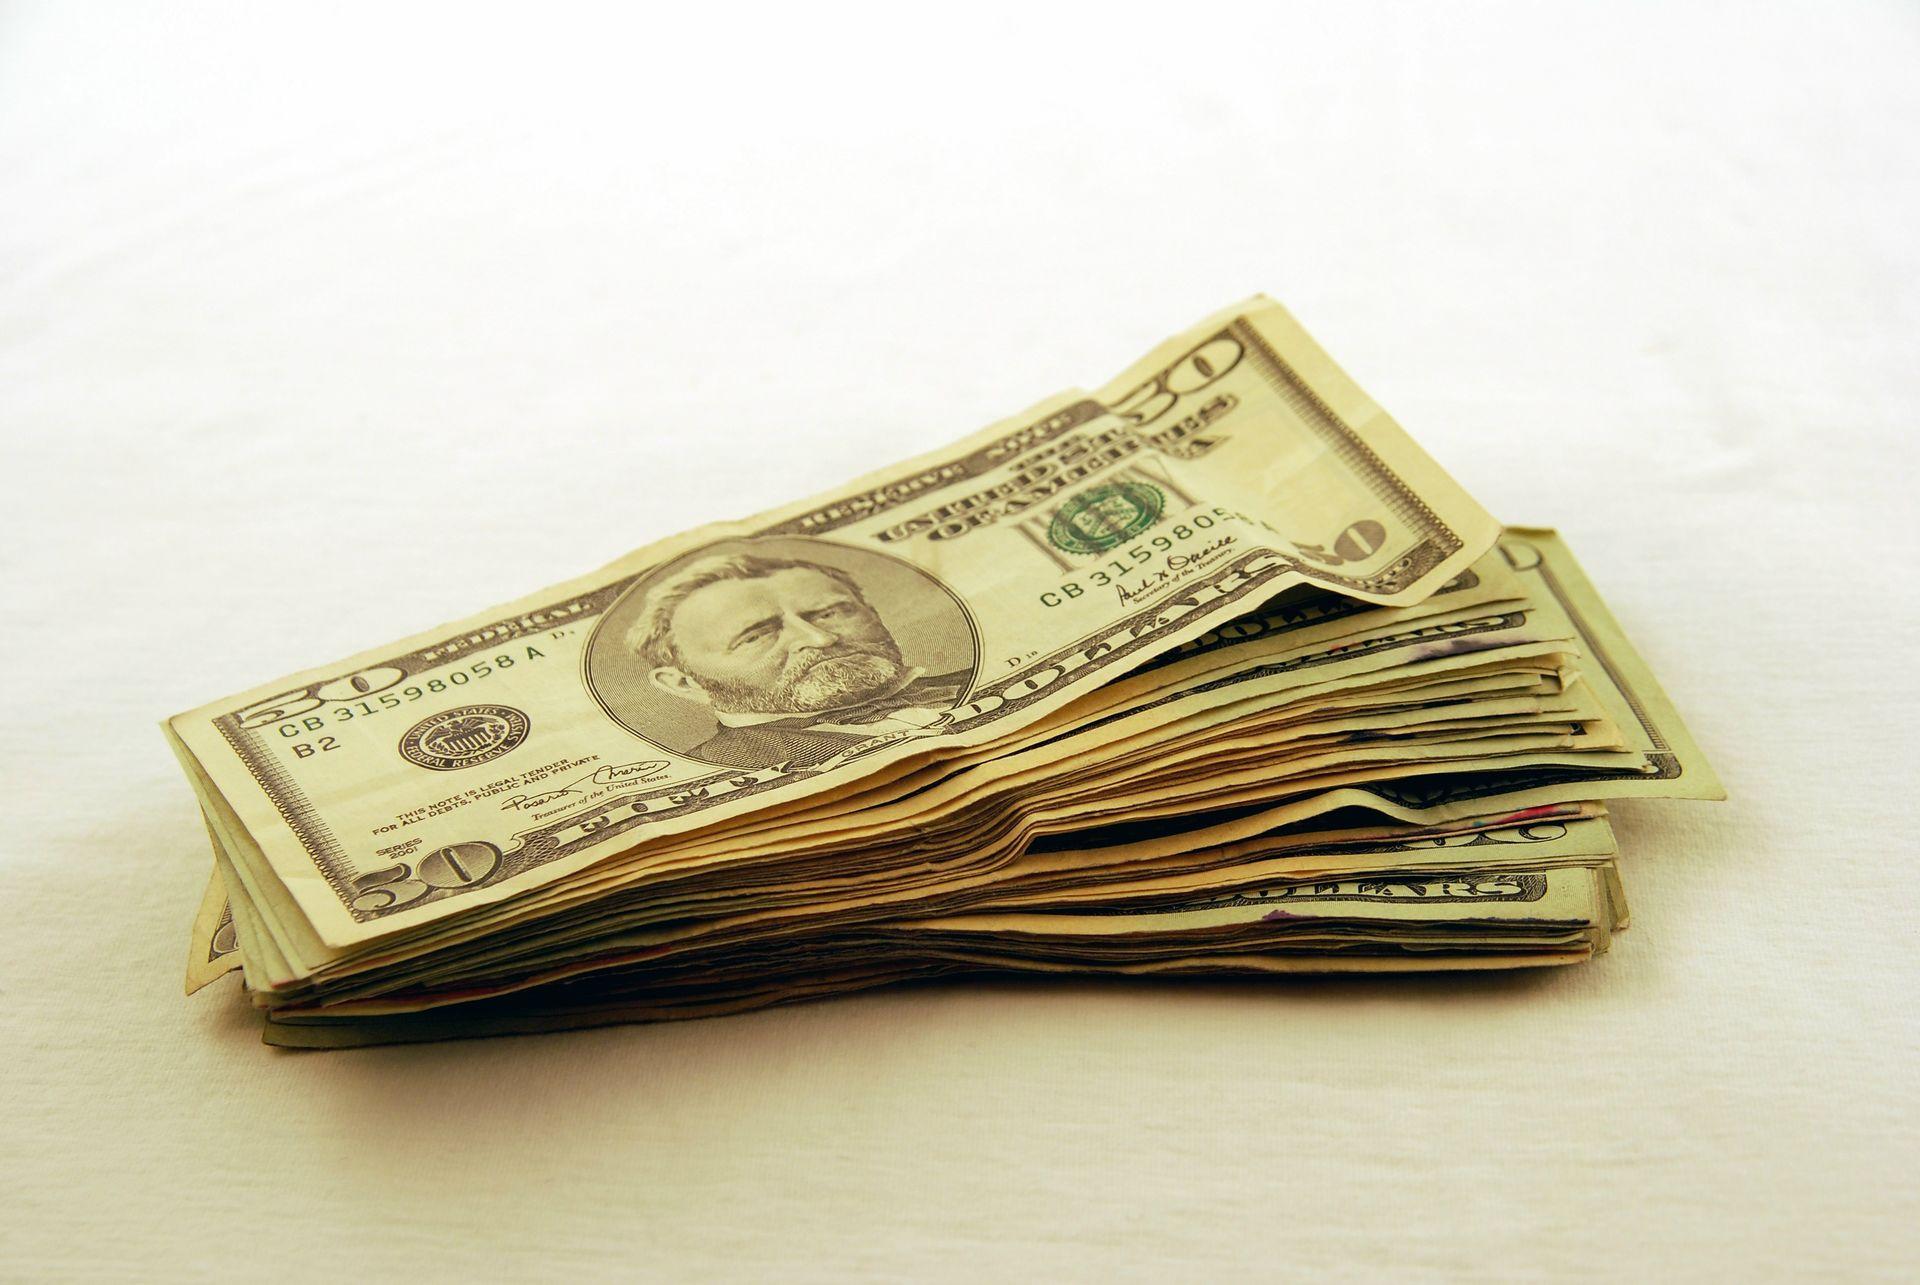 file0001074173227-money